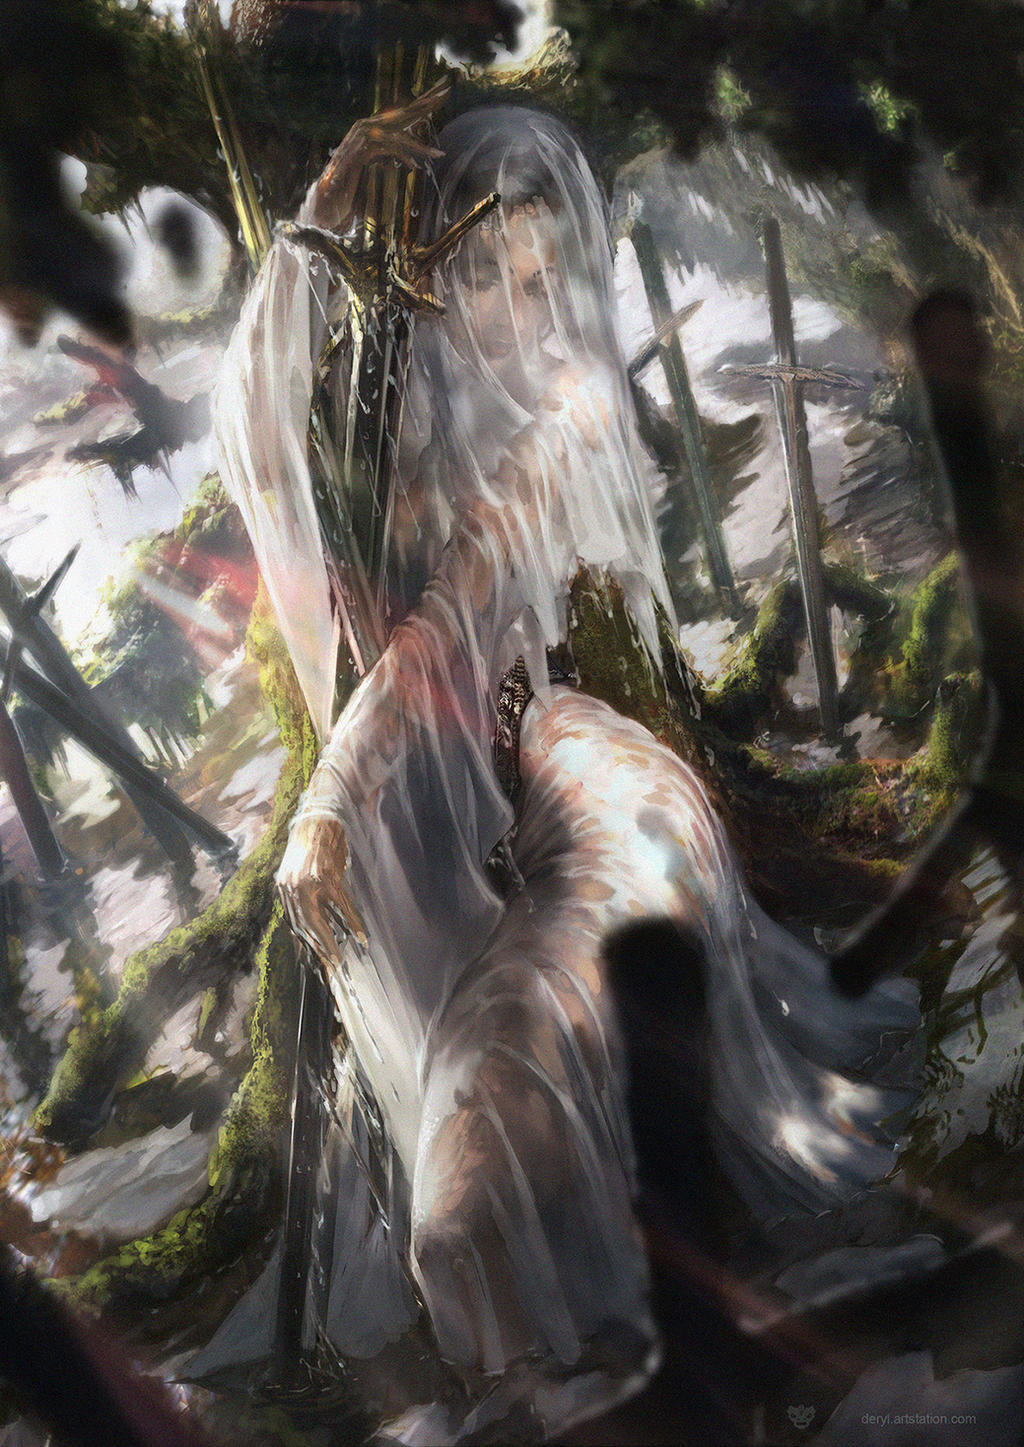 Siren of swords by derylbraun